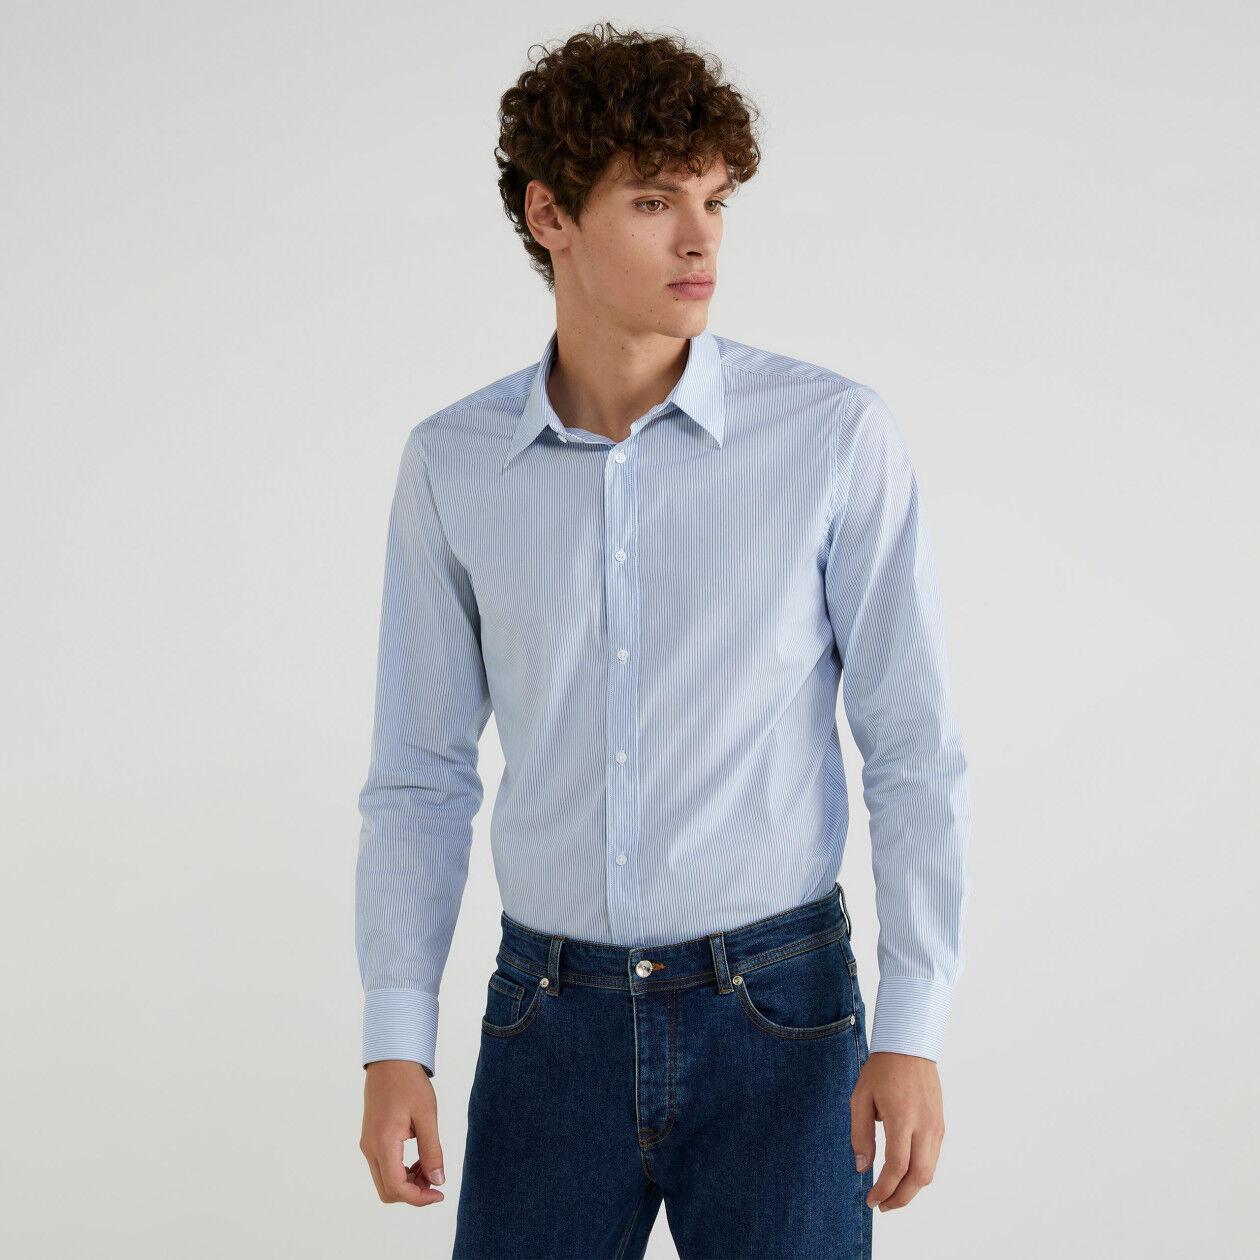 Slim fit yarn dyed shirt